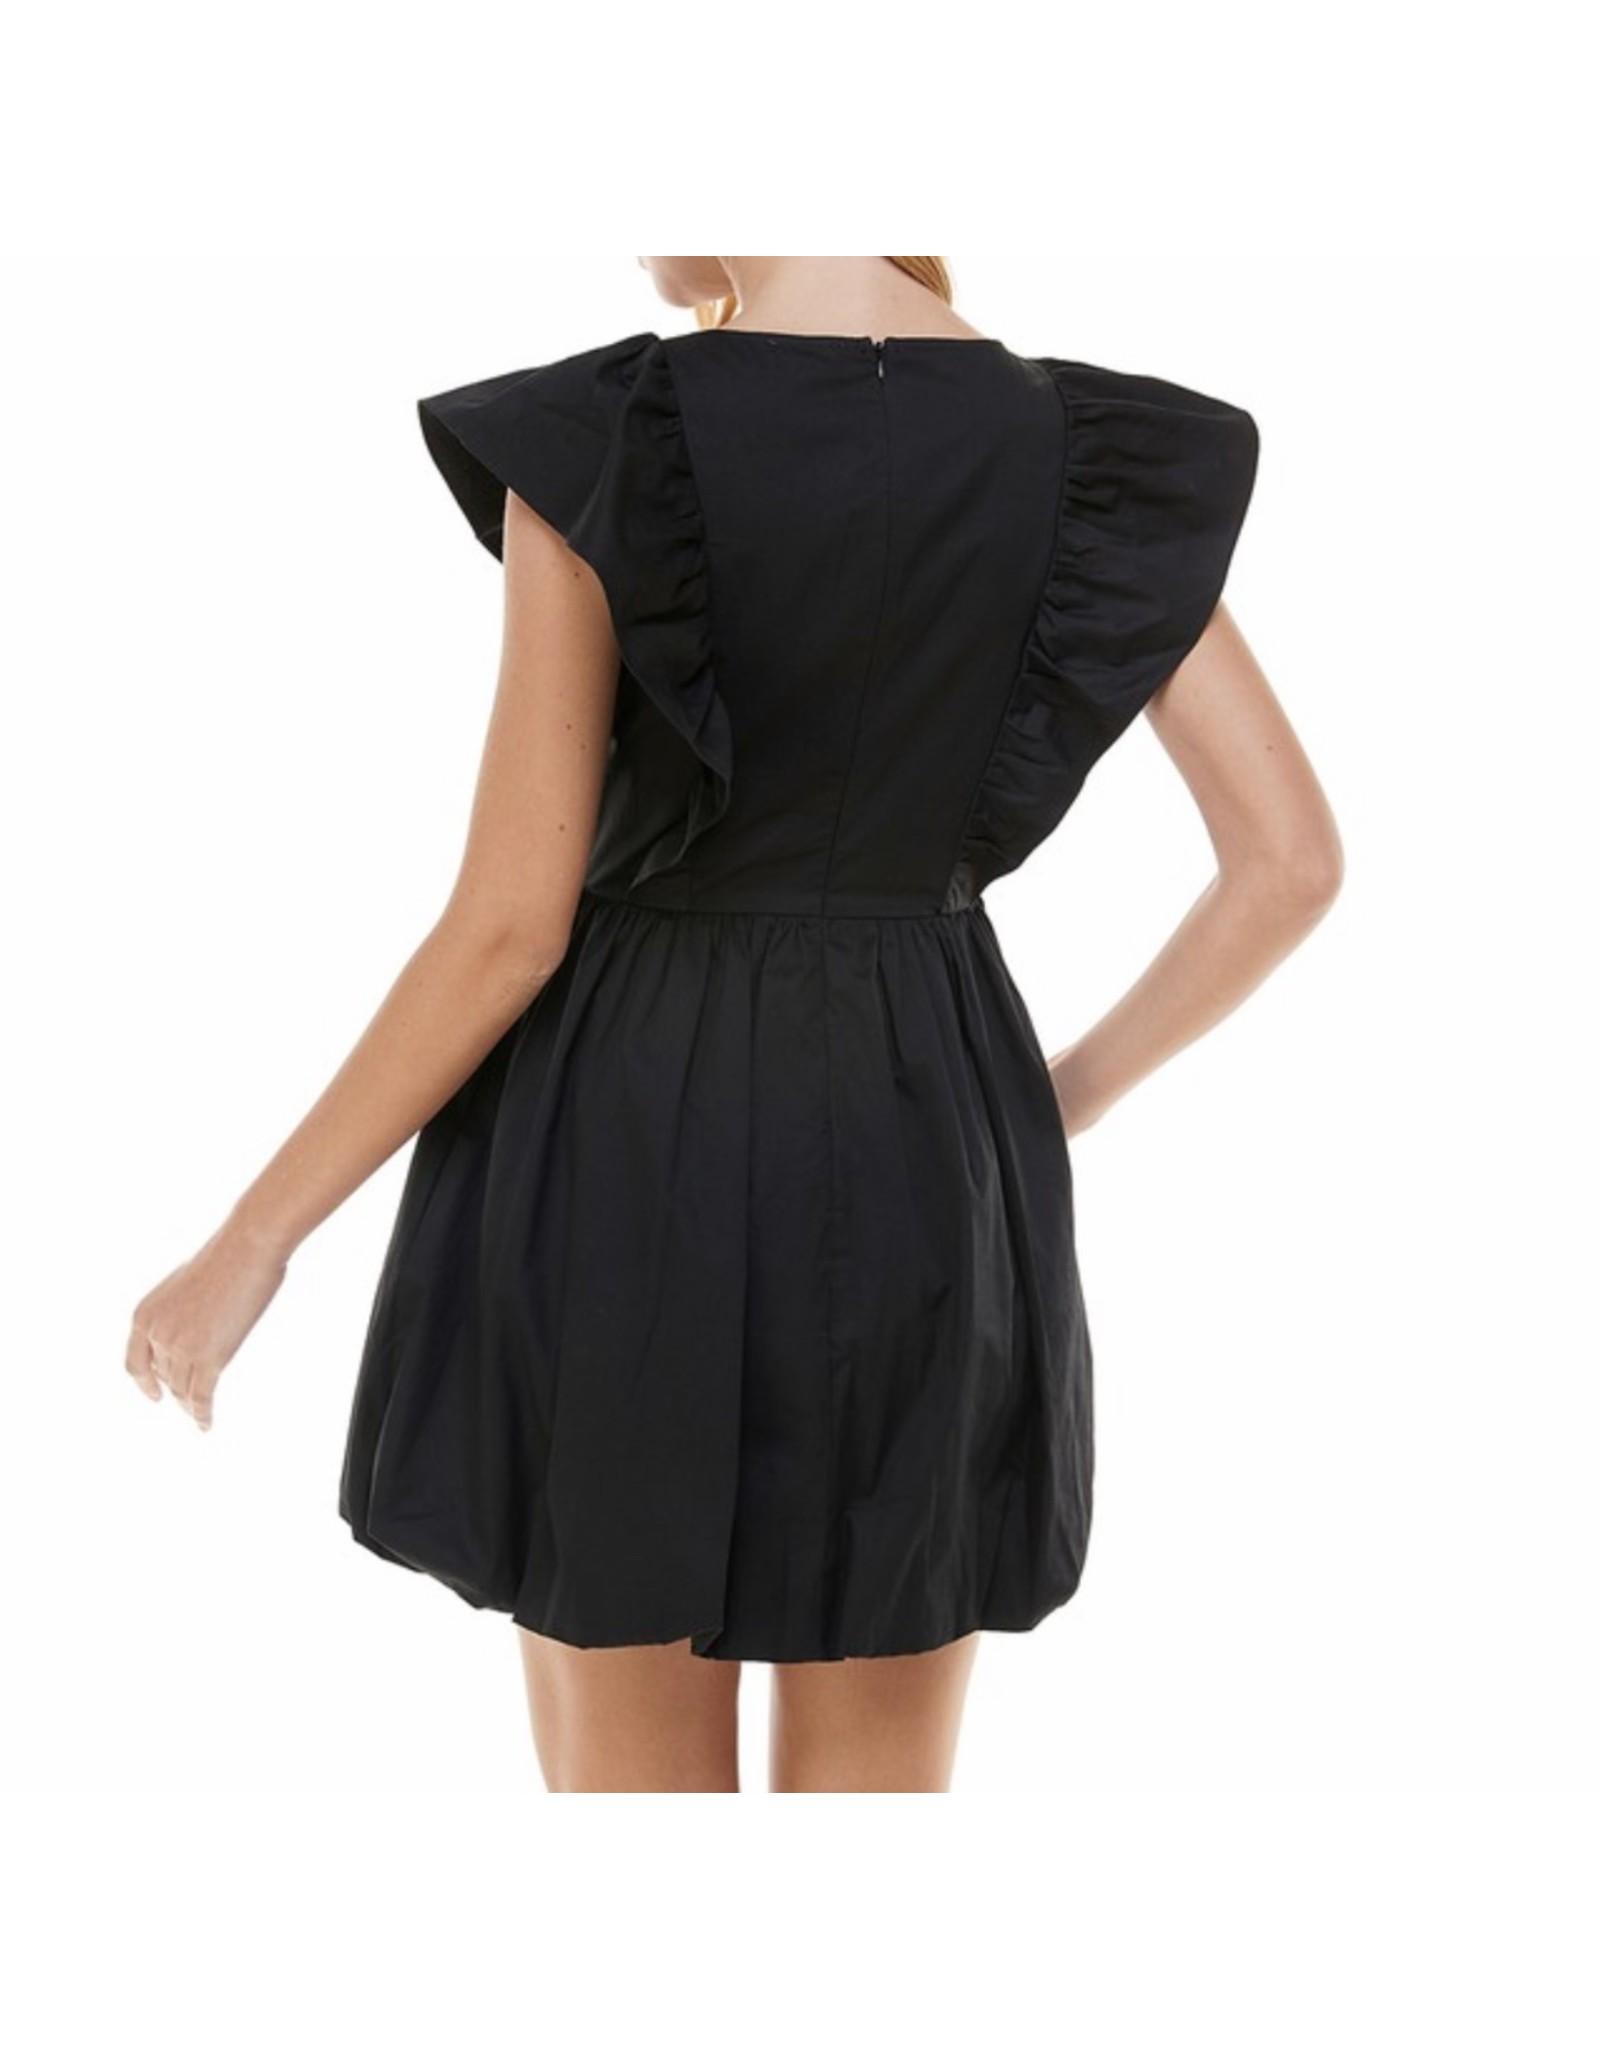 Smocked Detail Bubble Dress - Black